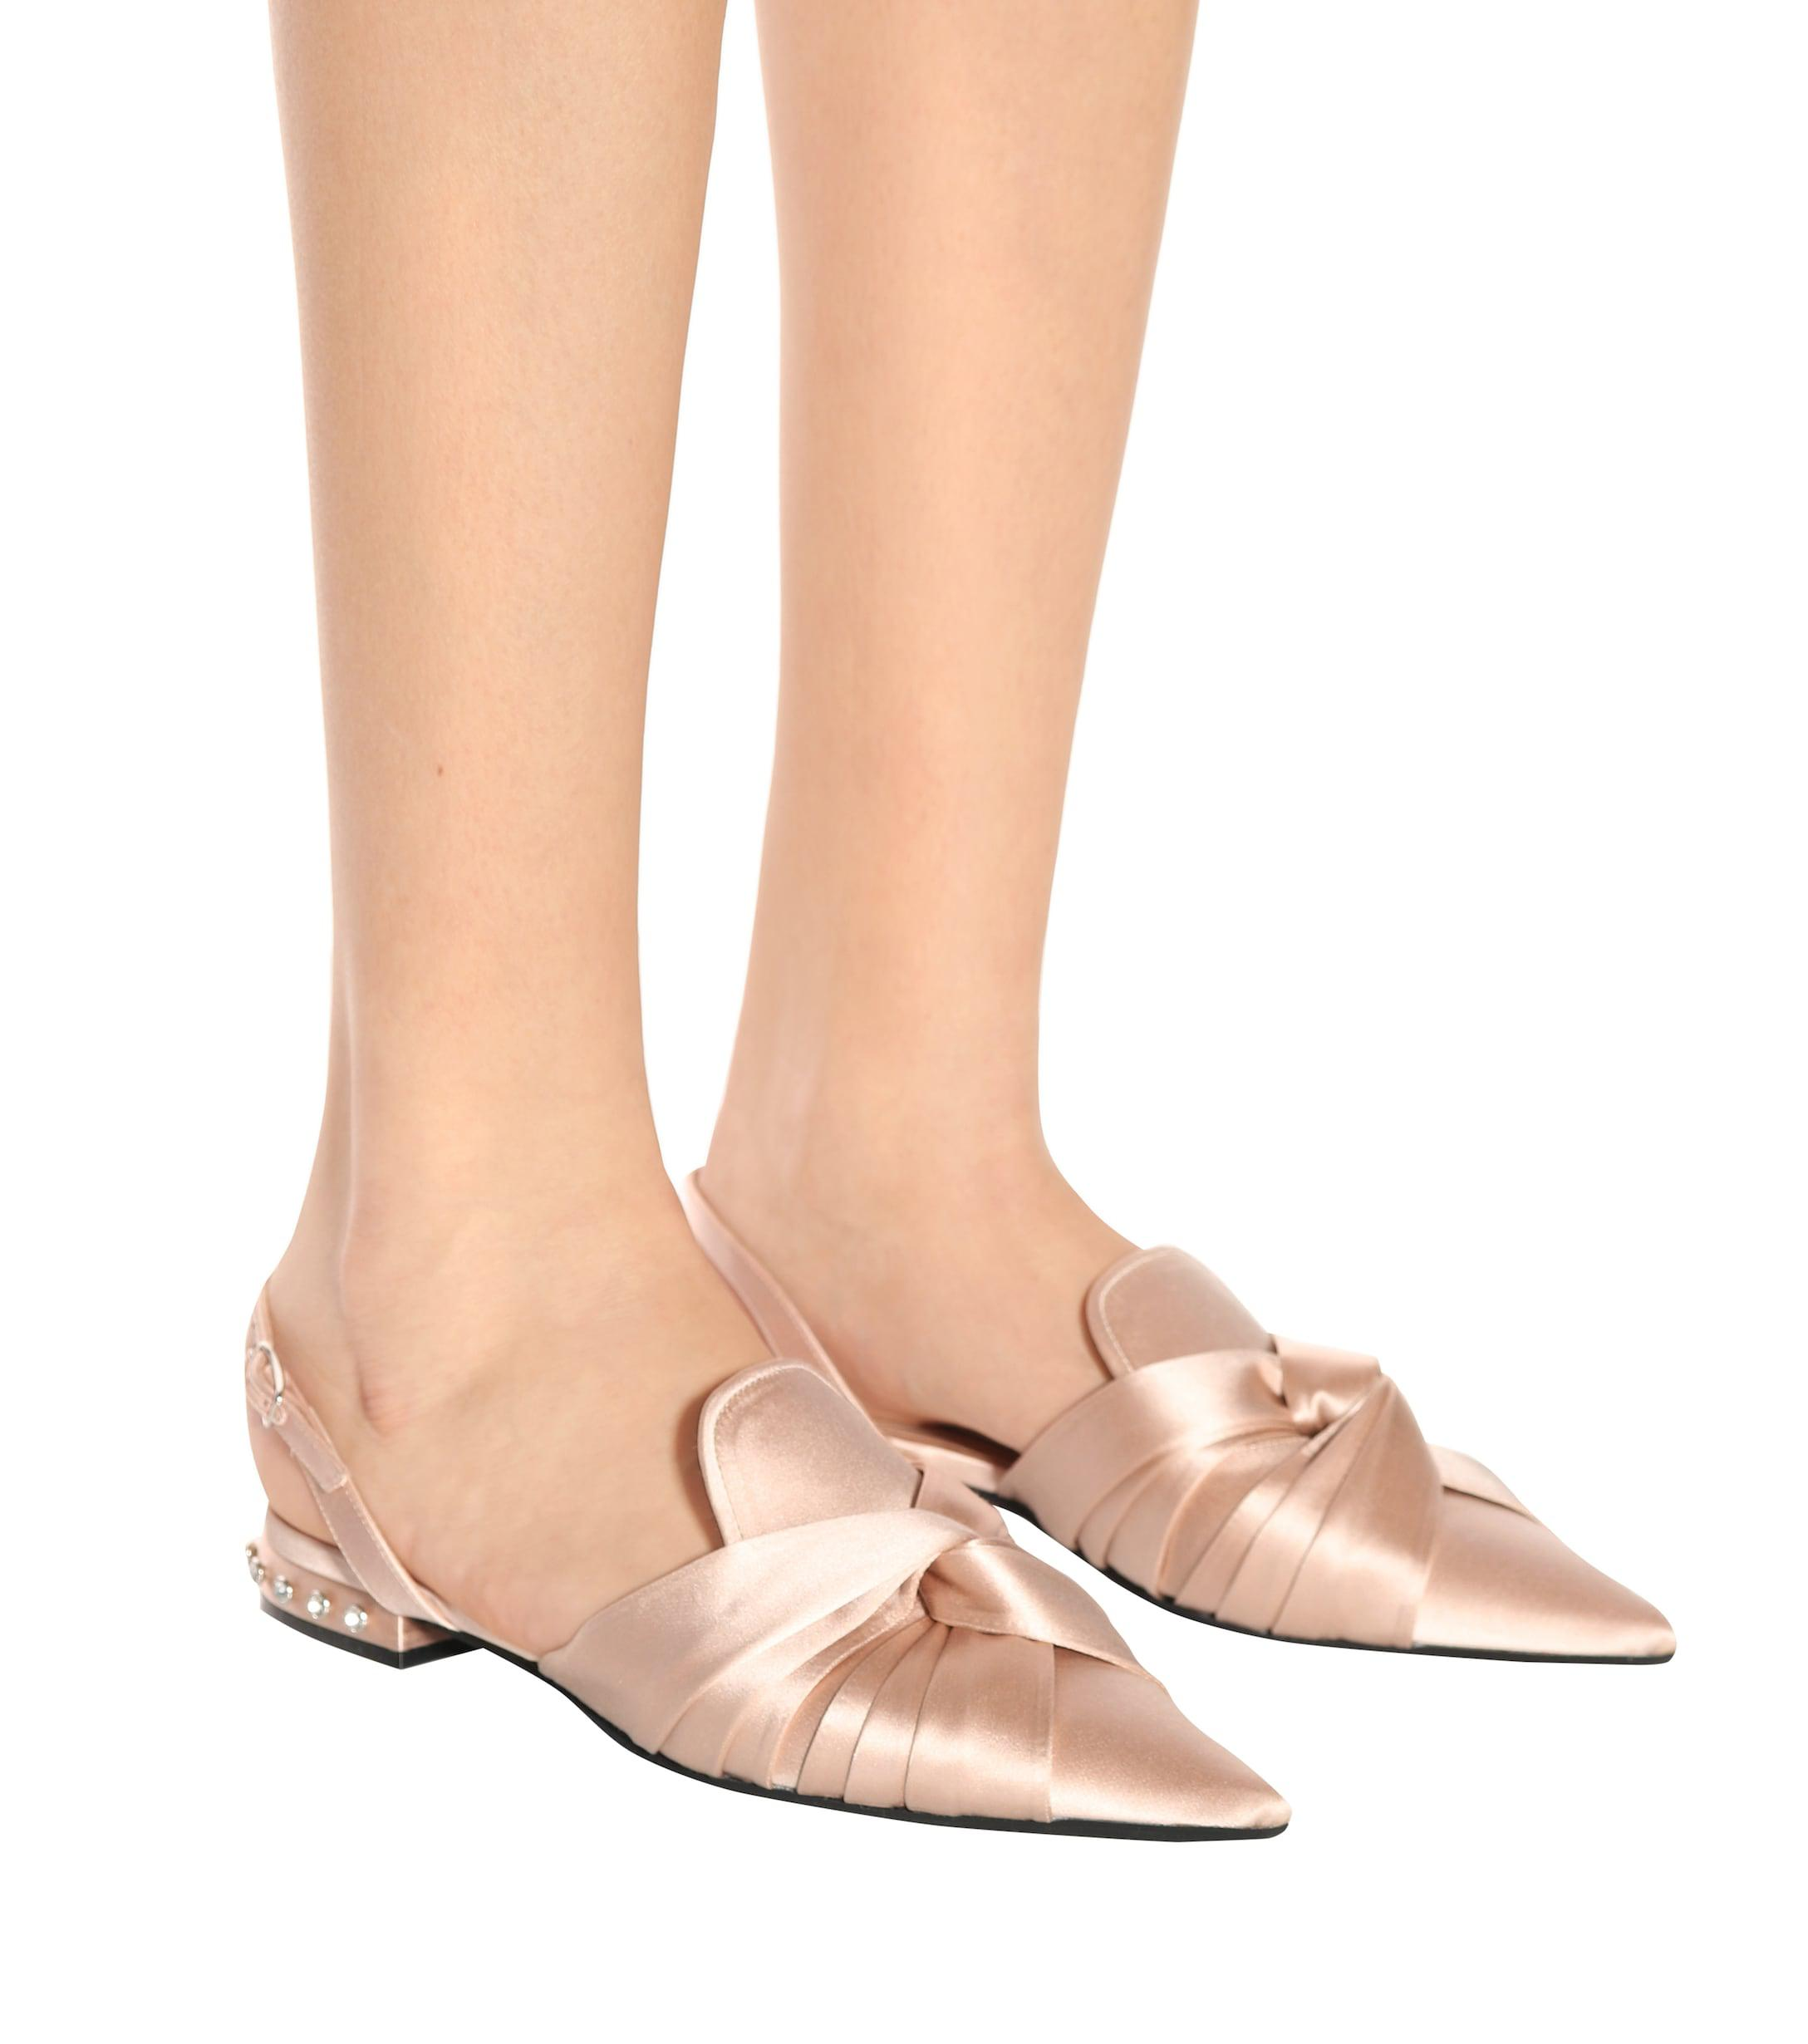 Bailarinas de satén con talón al descubierto N°21 de Raso